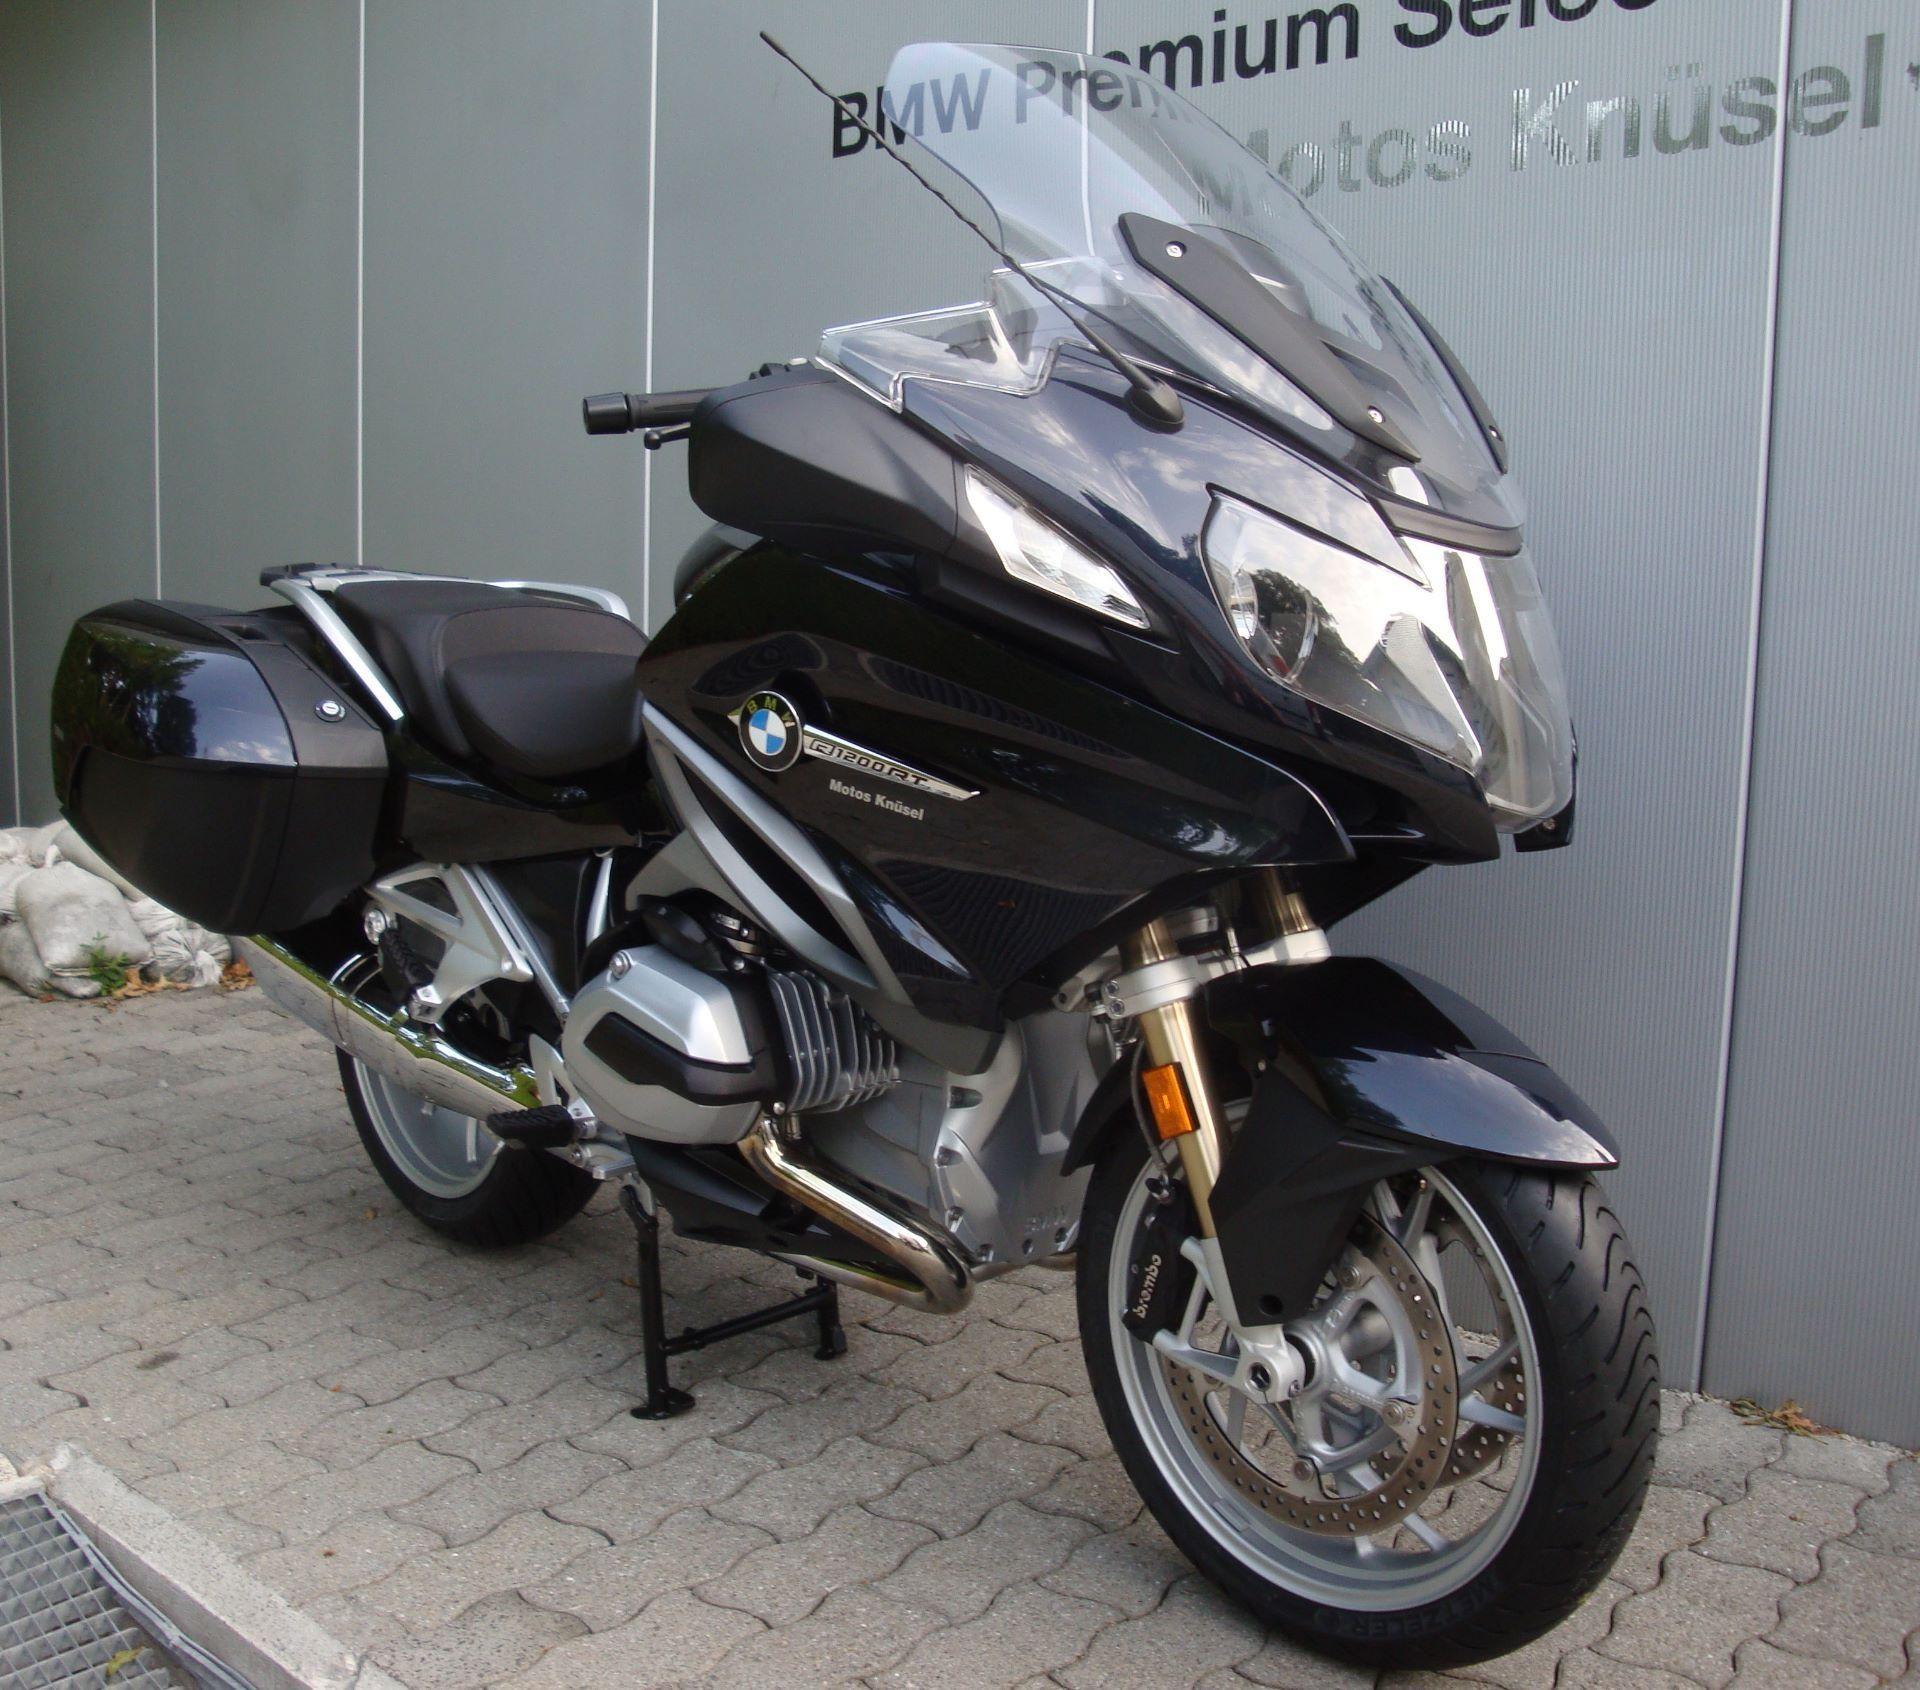 motorrad occasion kaufen bmw r 1200 rt abs motos kn sel gmbh ebnet entlebuch. Black Bedroom Furniture Sets. Home Design Ideas